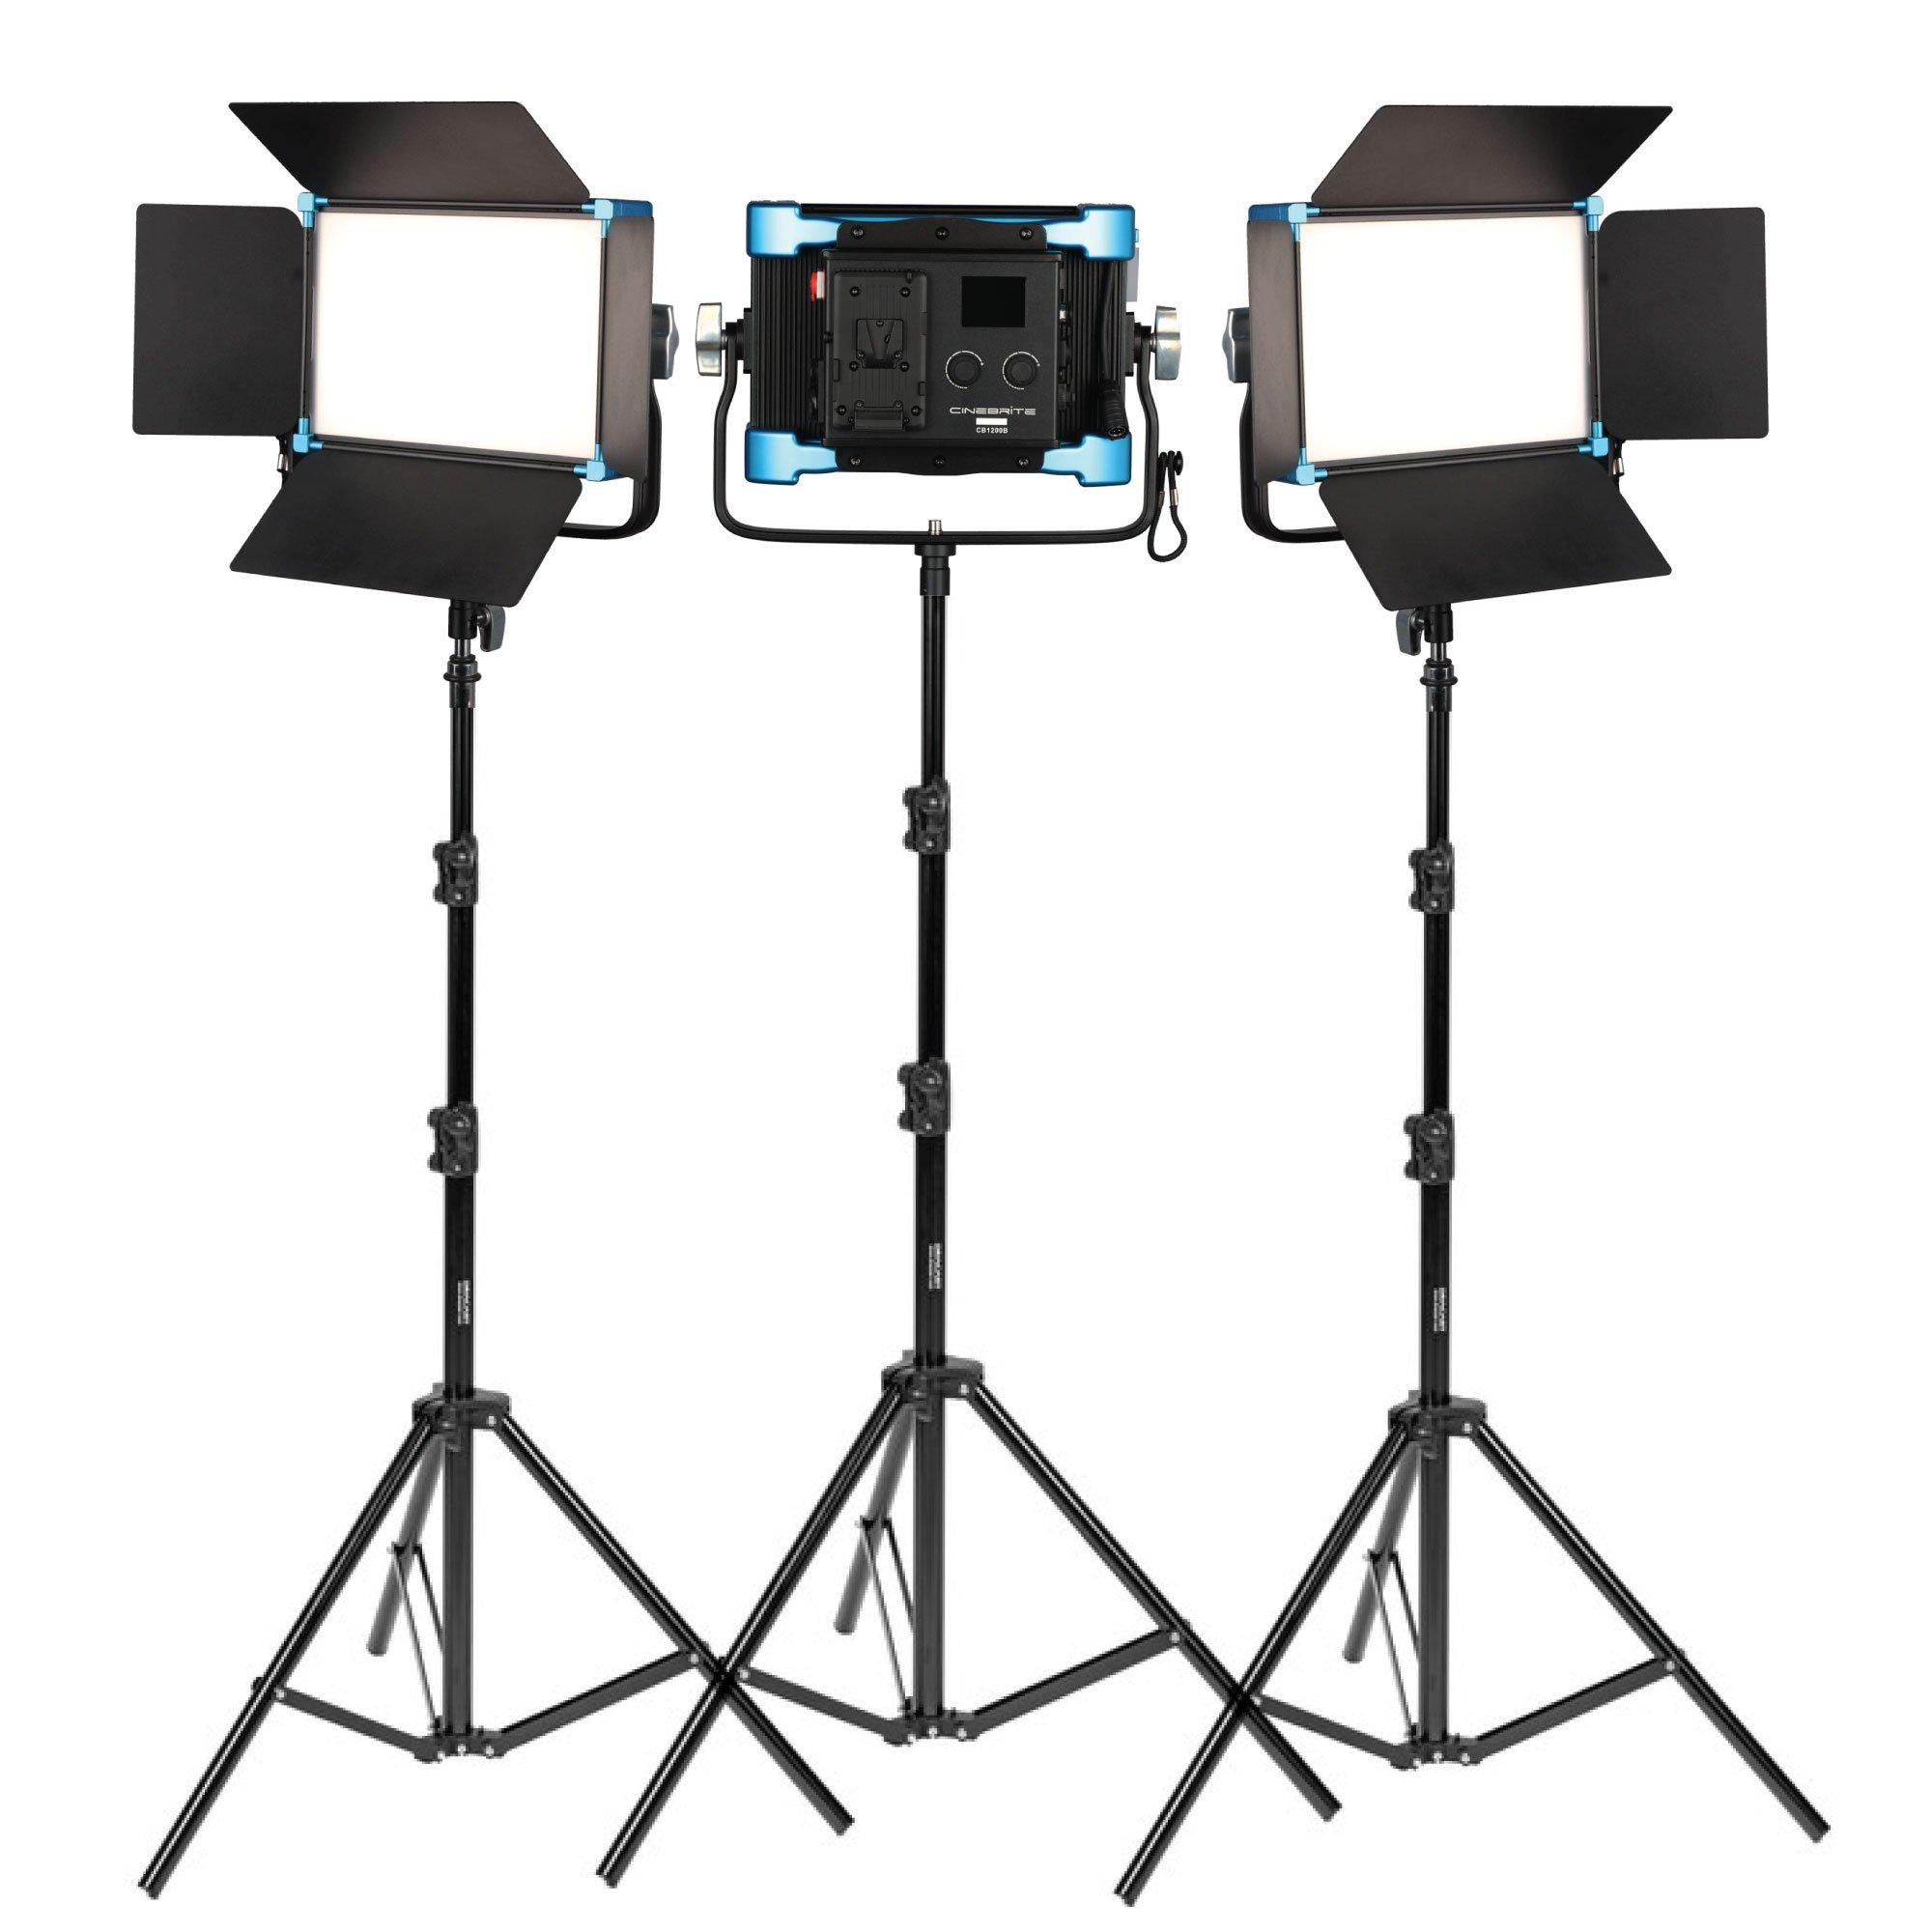 Cinebrite 1200 Bicolor studio lighting kit